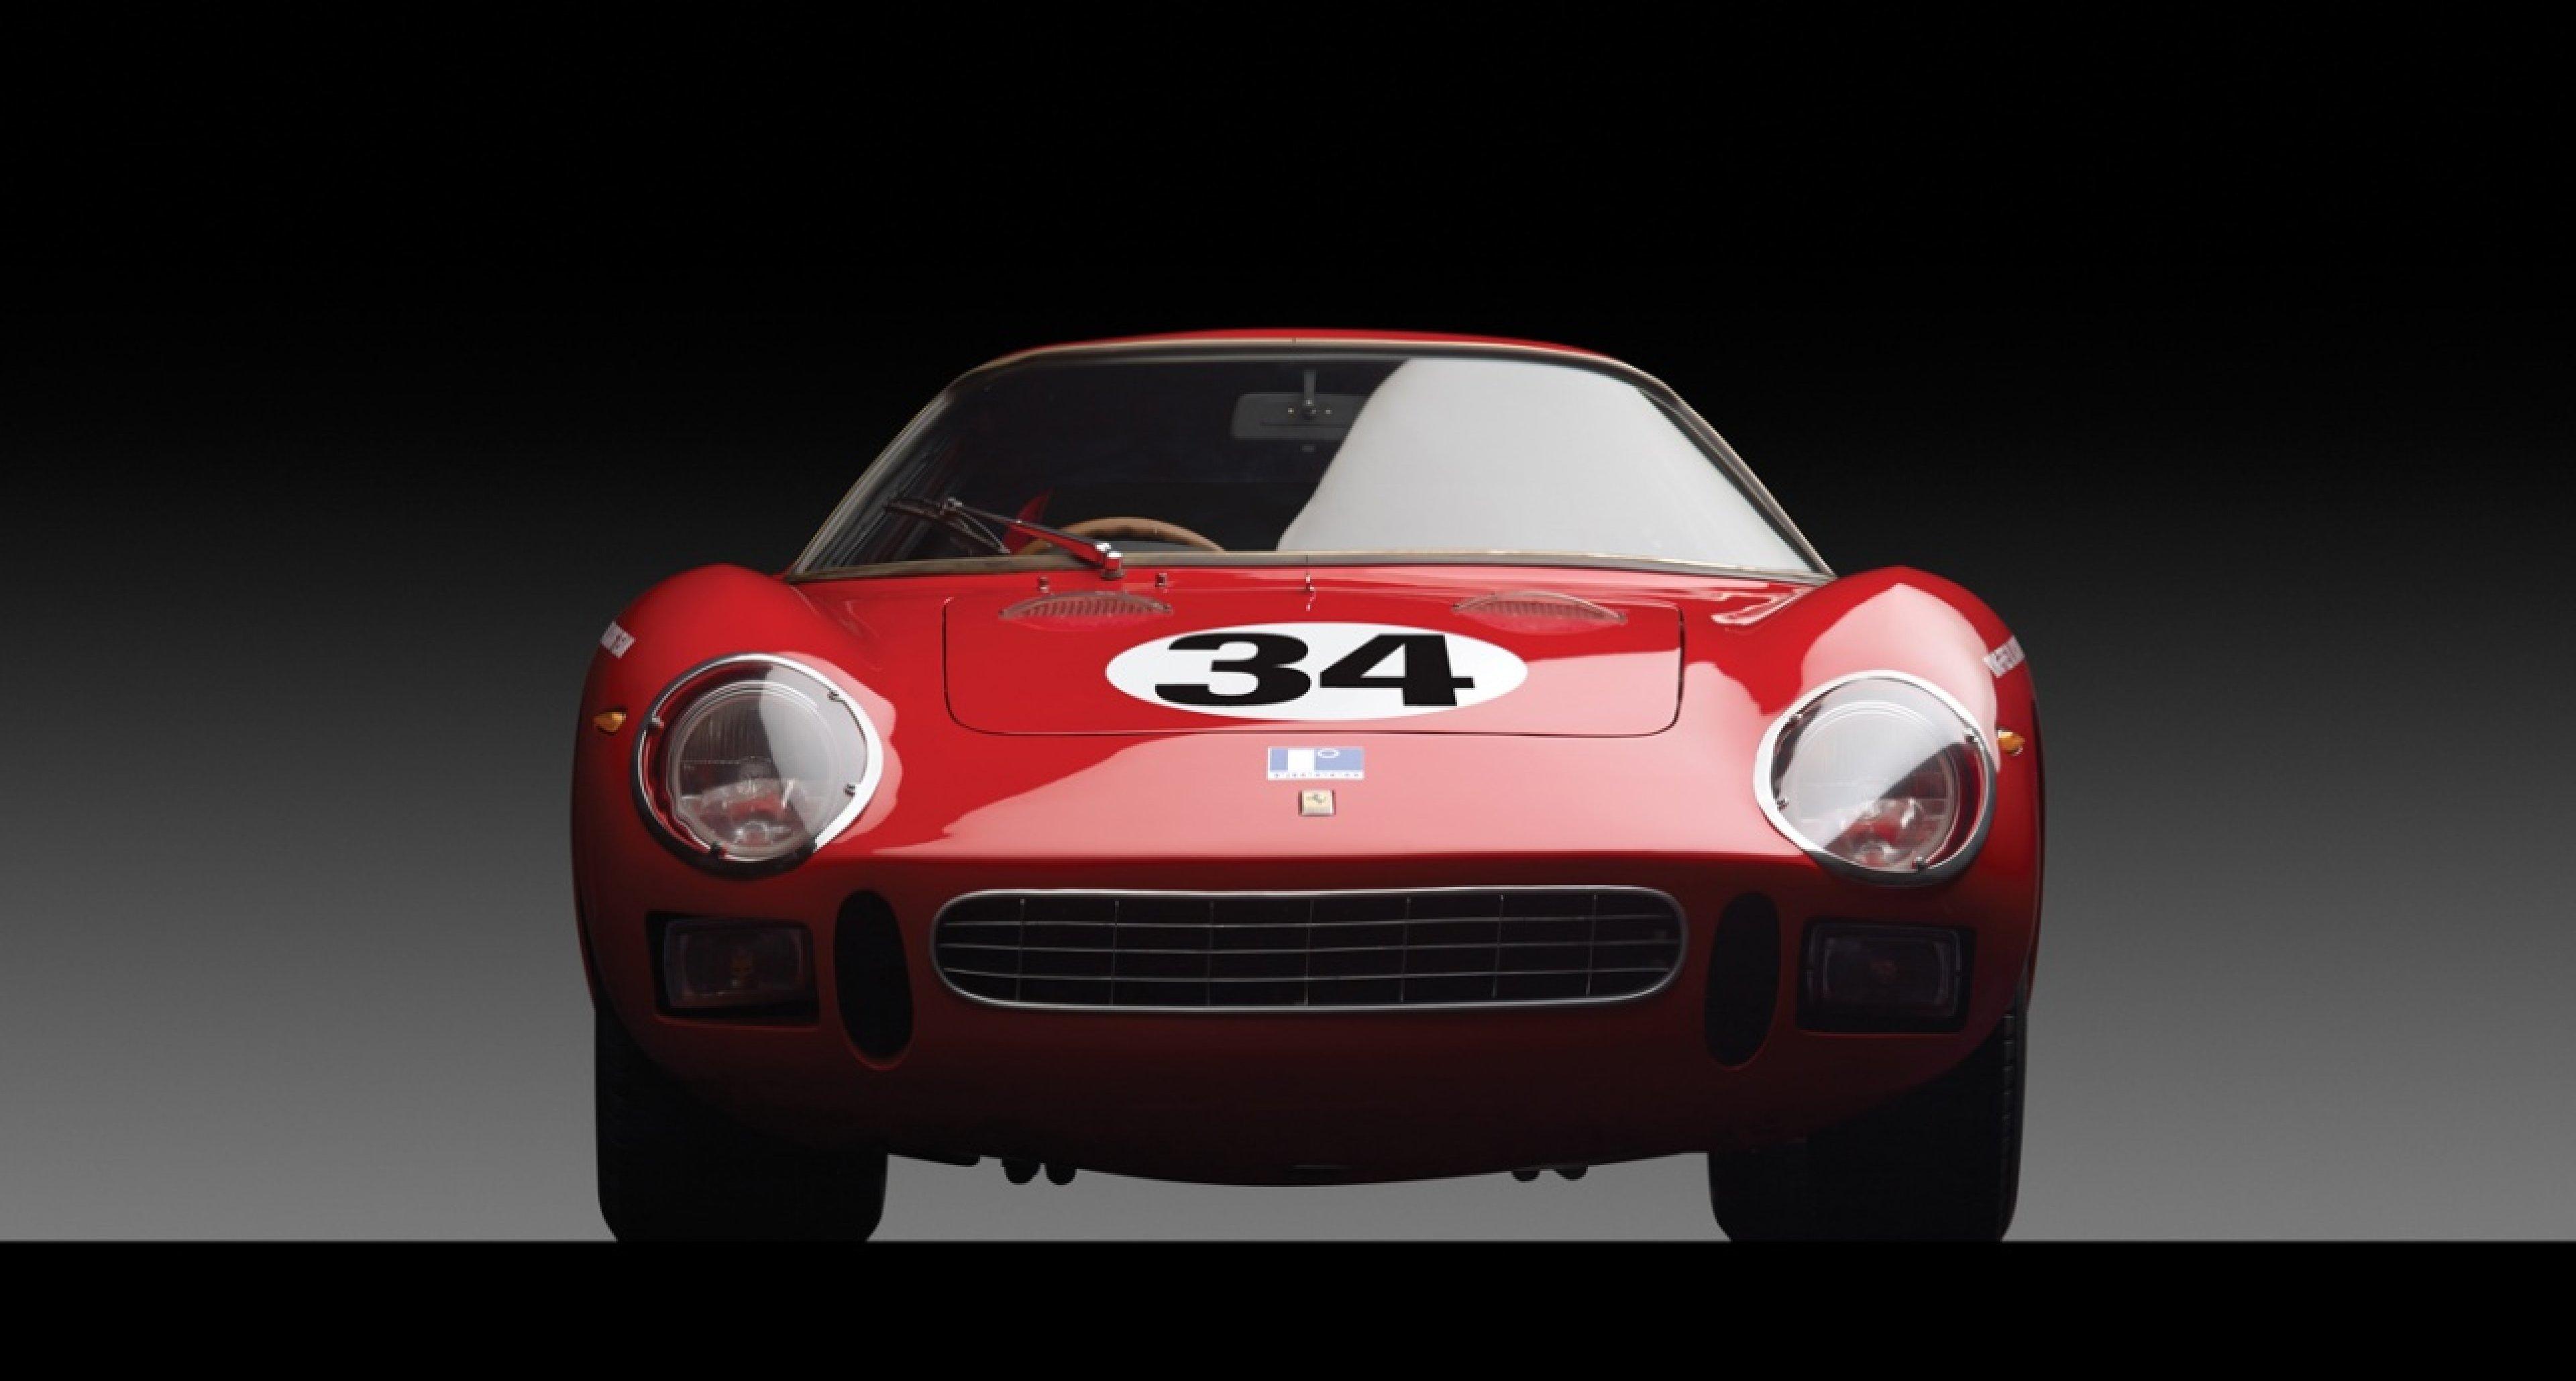 1964 Ferrari 250 LM USD 14,300,000